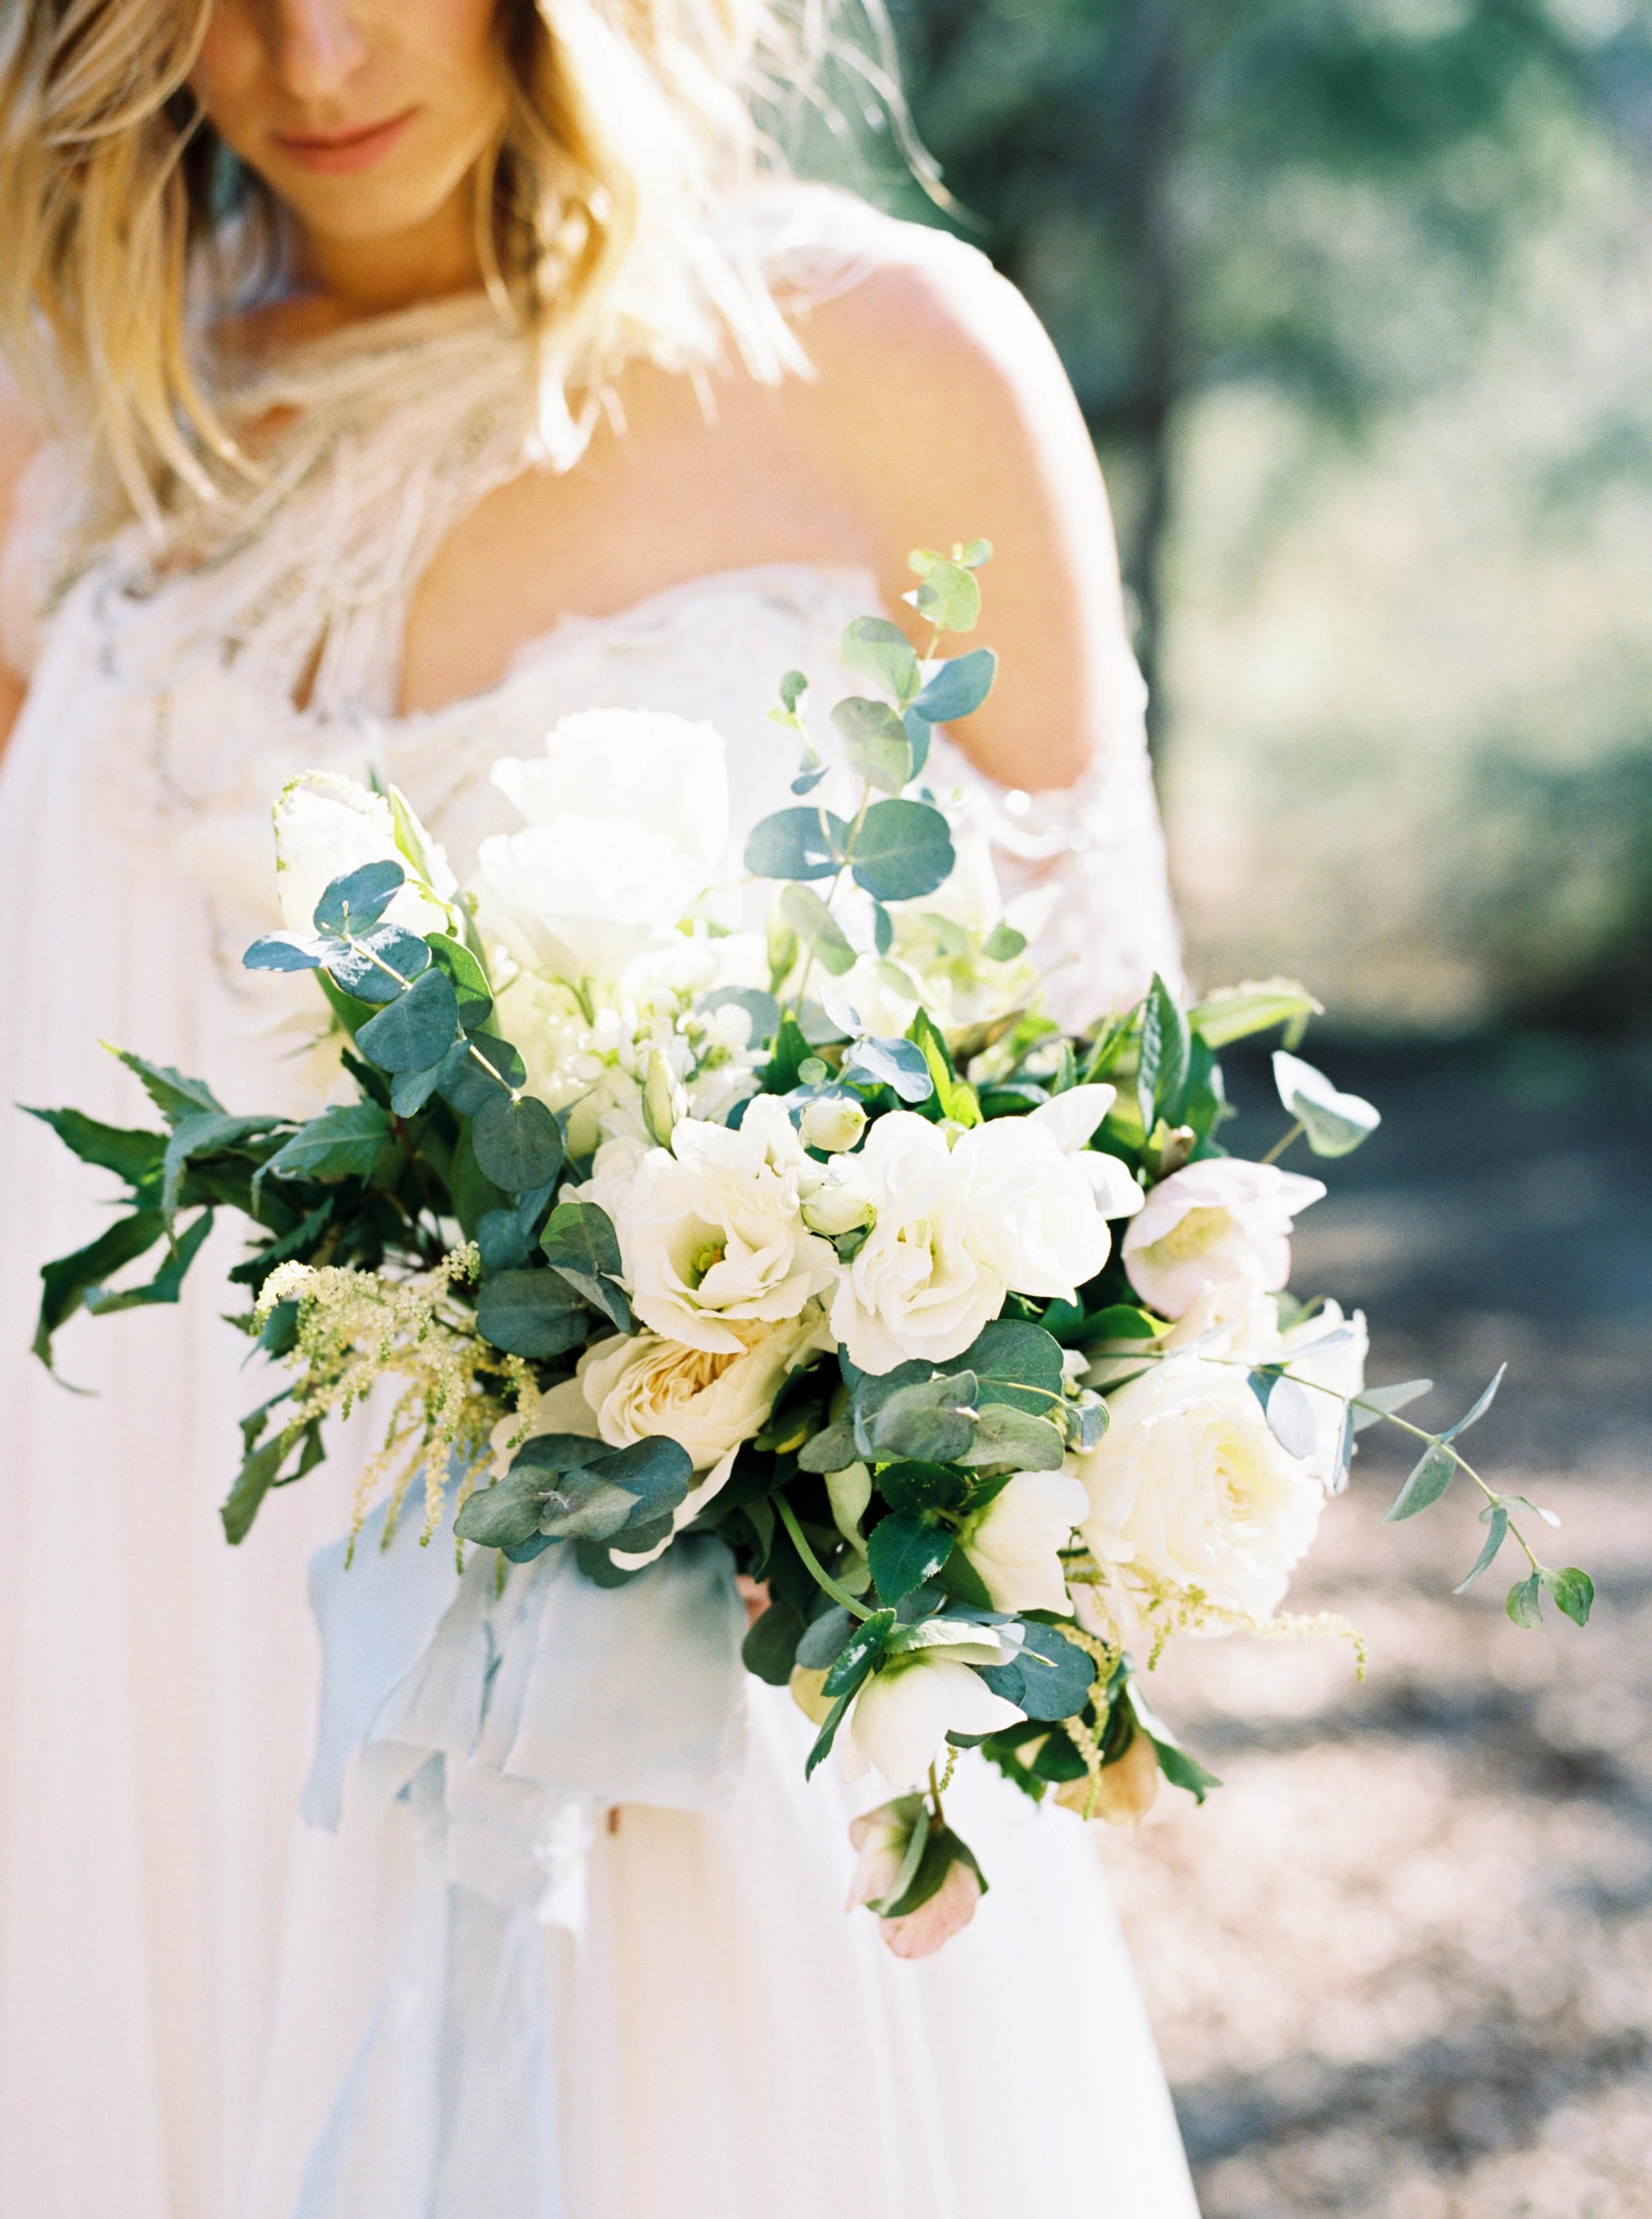 Danford-Photography-Bozeman-Montana-Arizona-Fine Art Film-Wedding-Engagement-Photographers-16.jpg